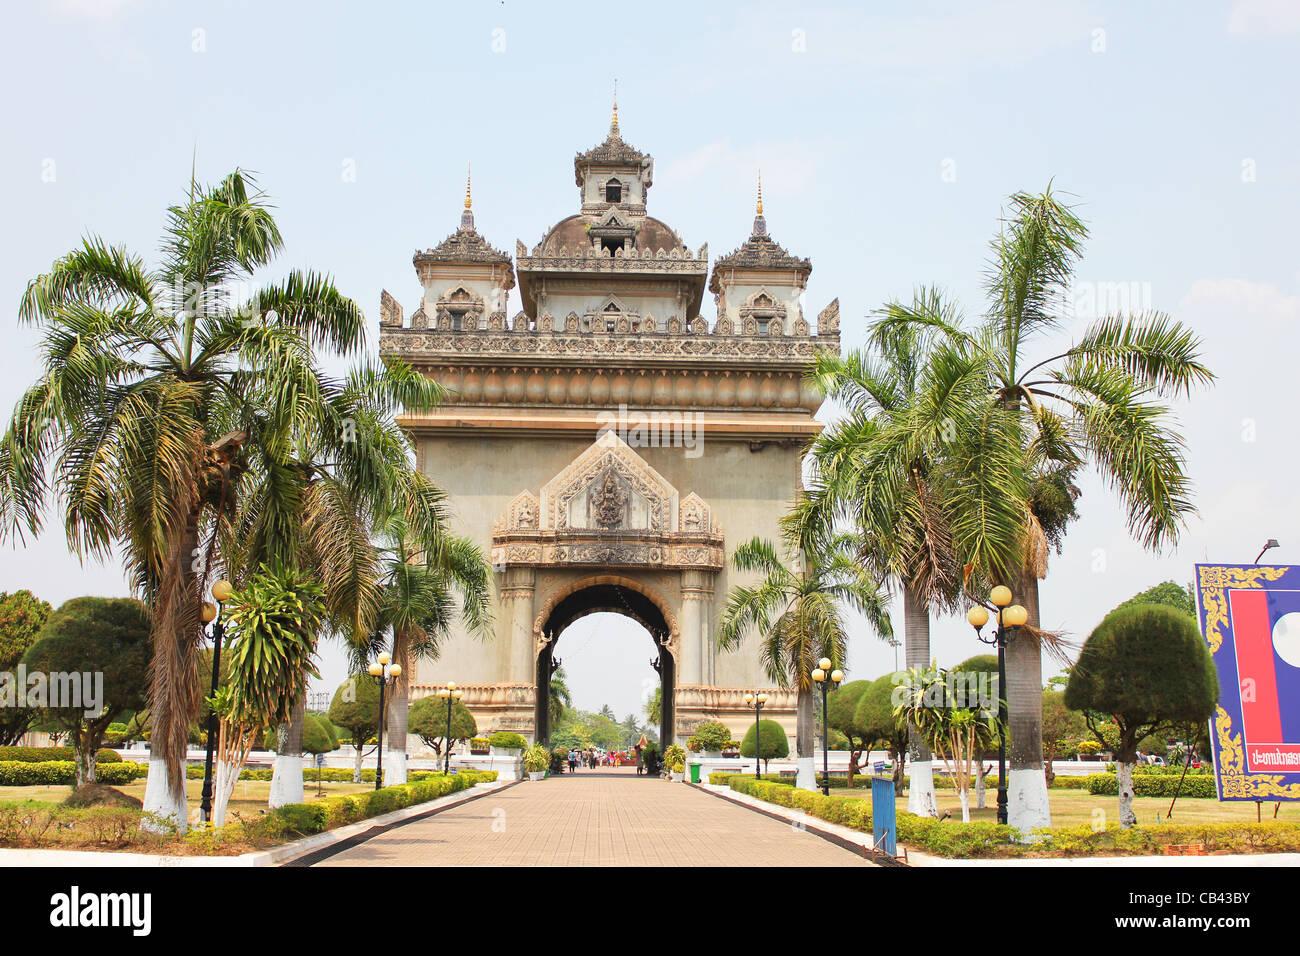 French architecture, Vientiane, Laos. - Stock Image